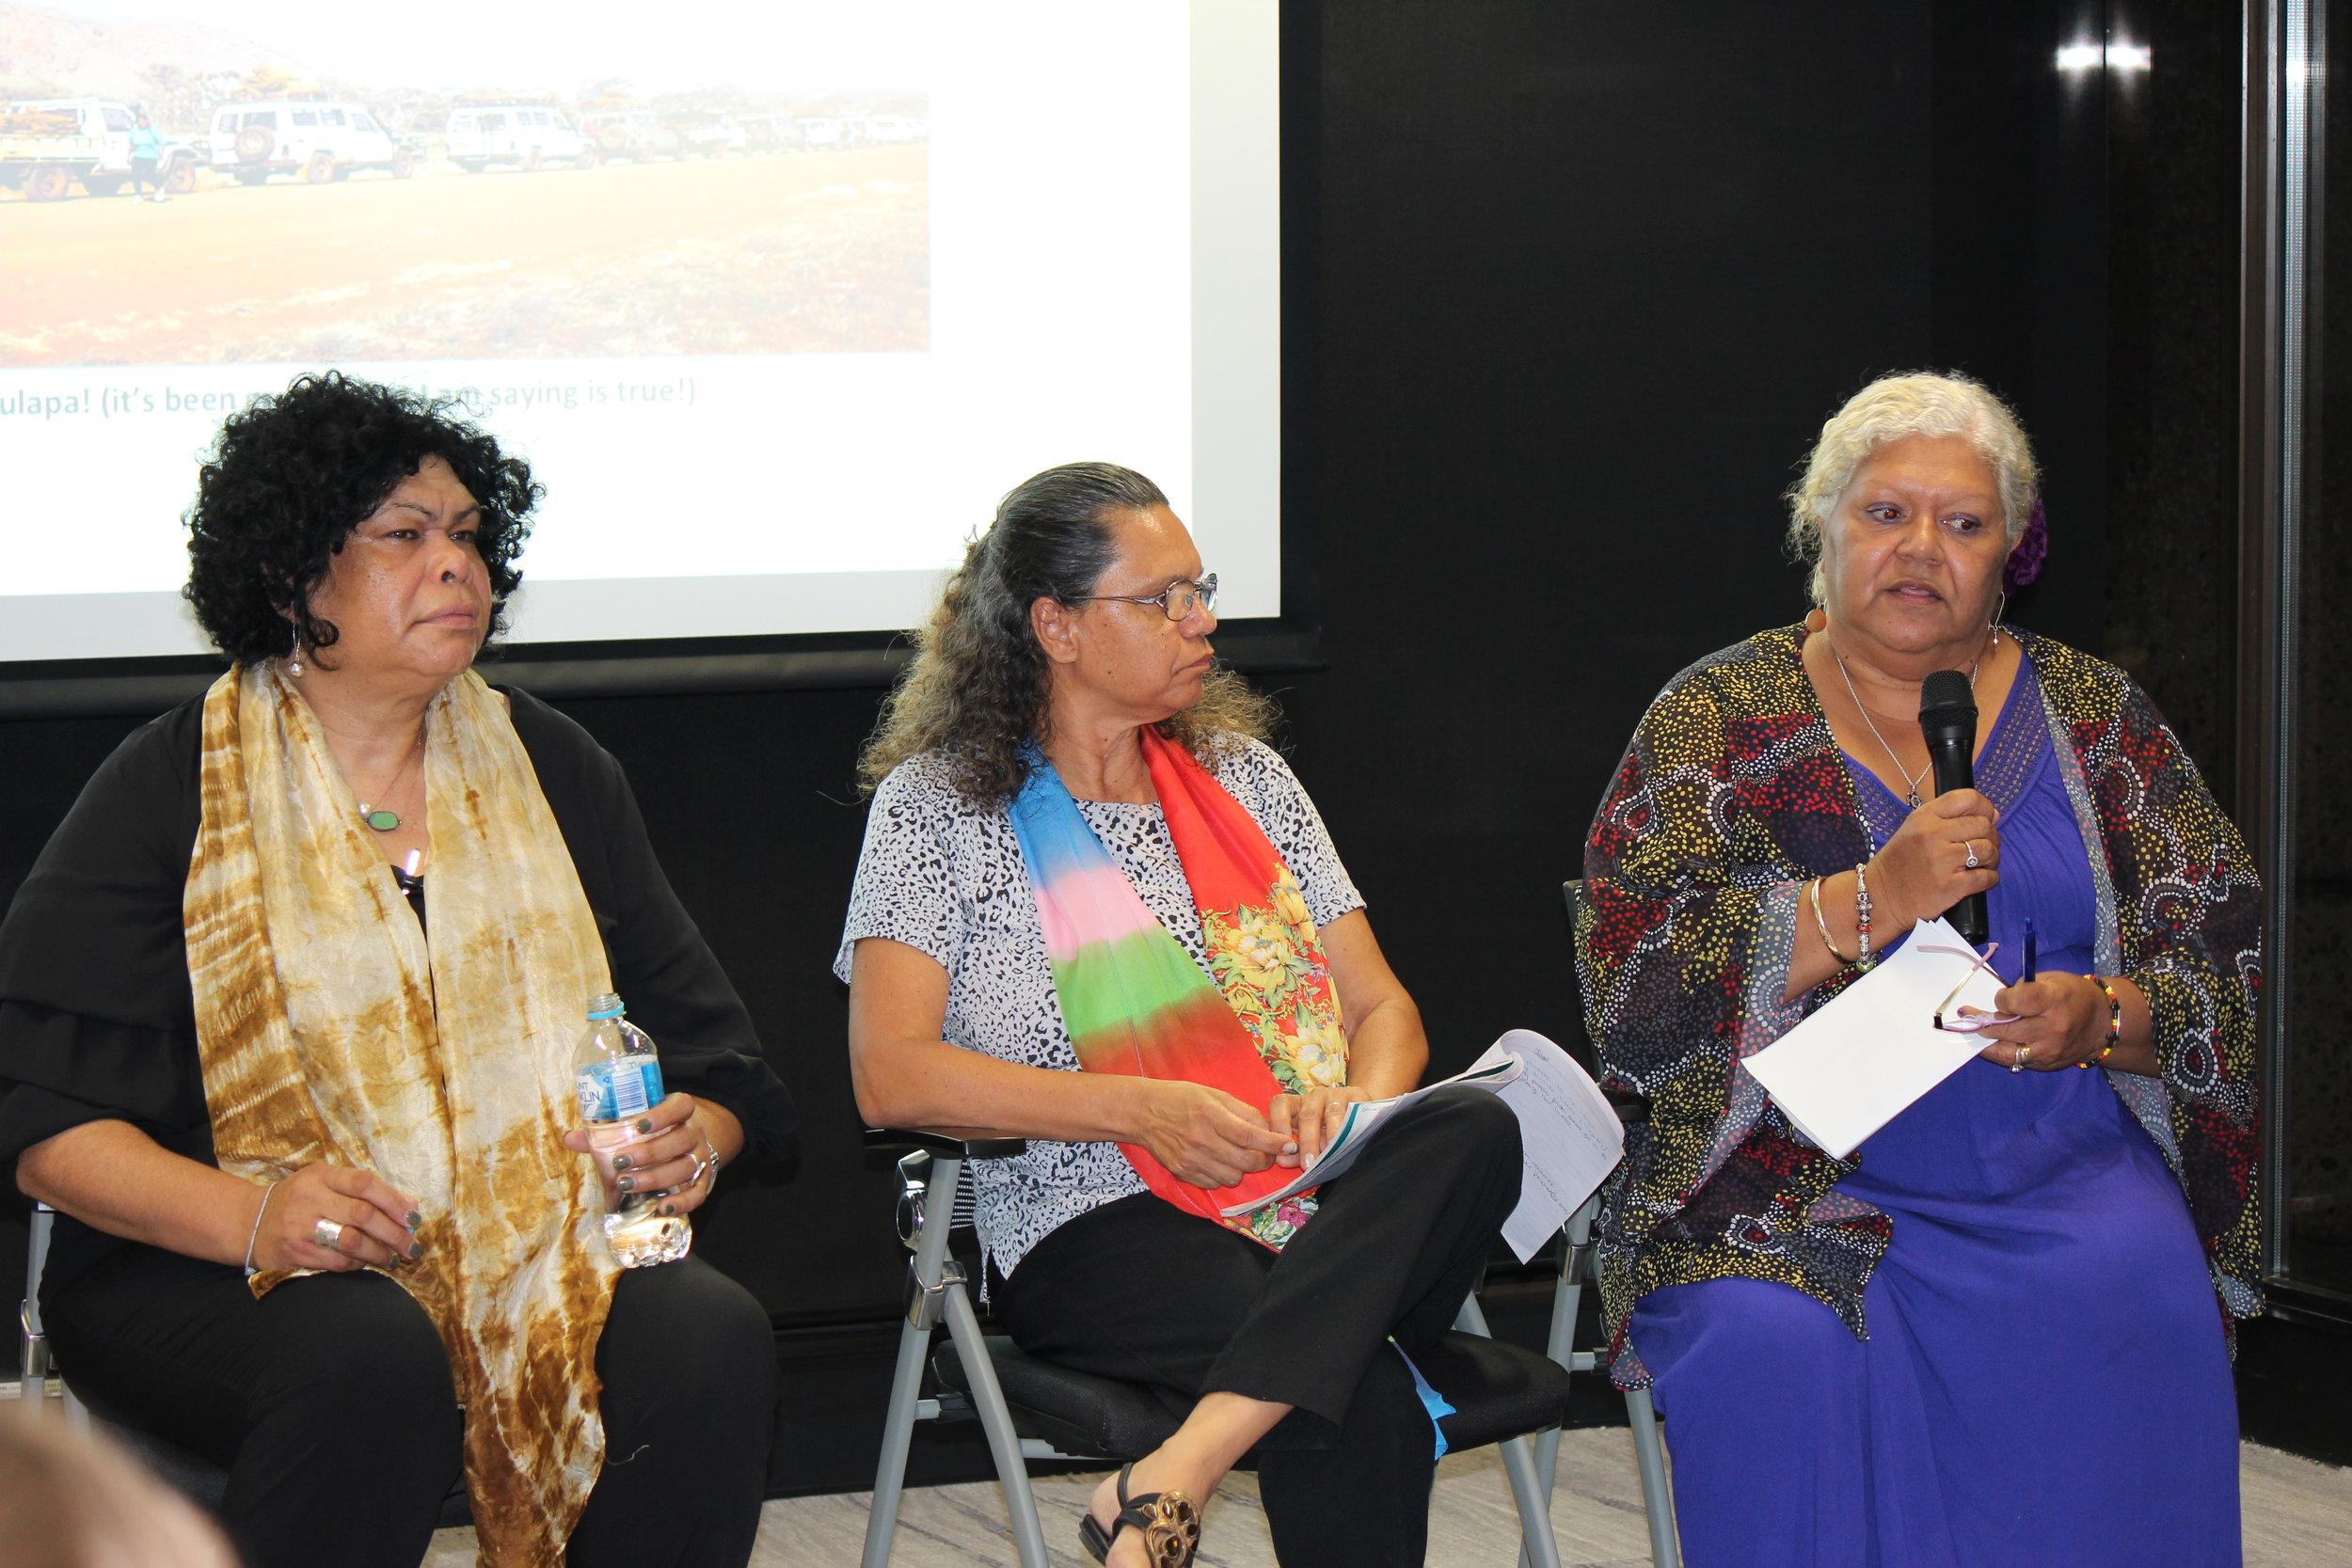 Left to right: Andrea Mason, Kayleen Manton and Sharon Minniecon